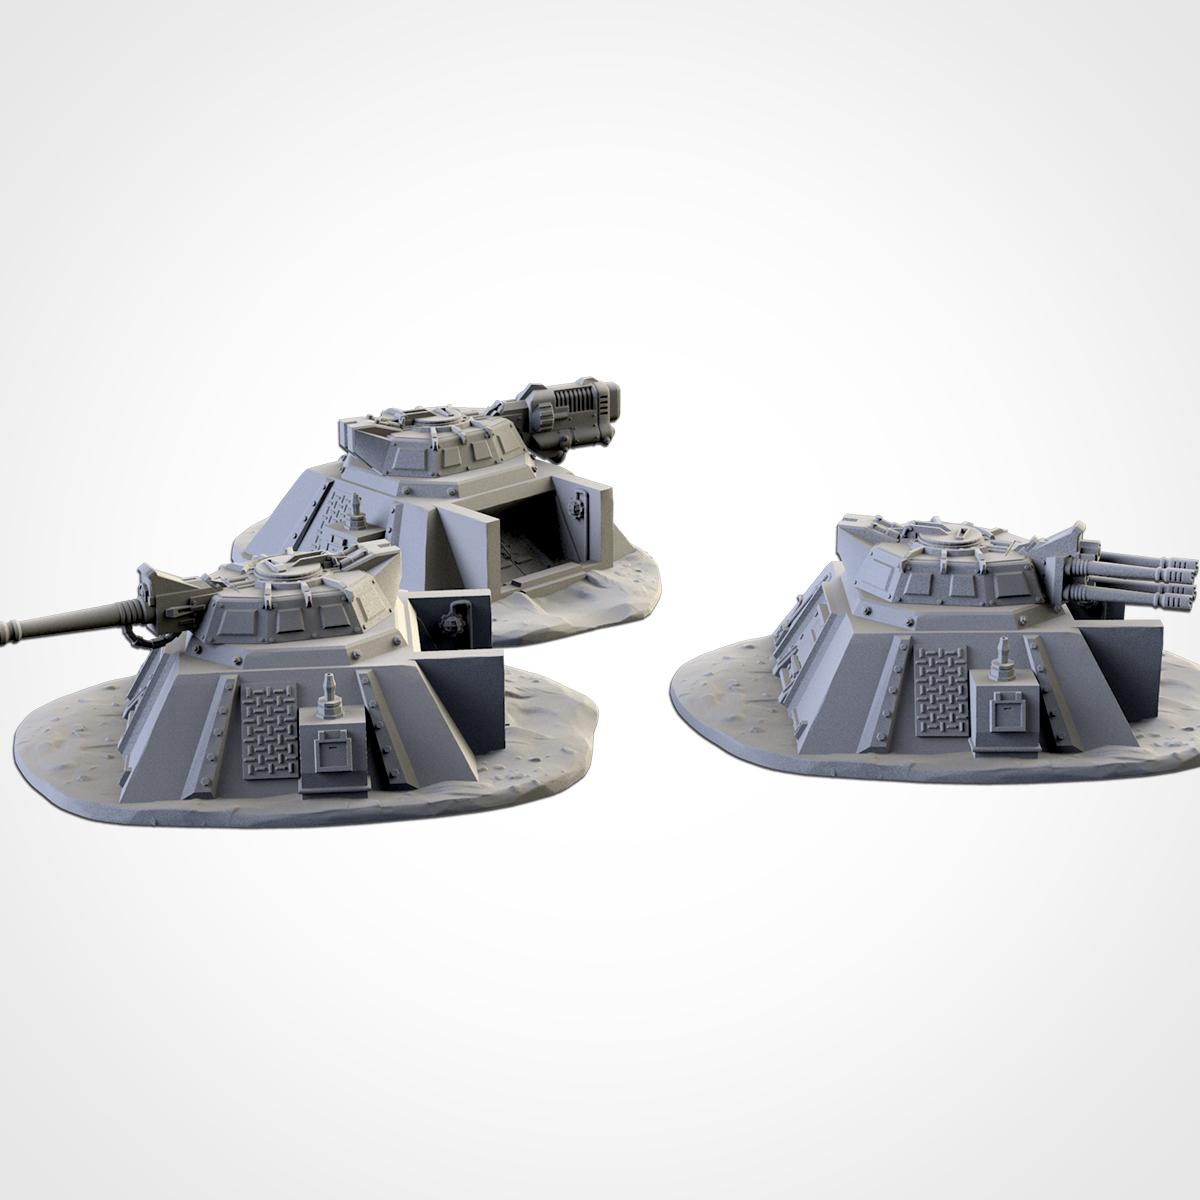 TXFA_WEB_BUNKERS_02.jpg Download STL file ARMED BUNKERS • 3D printer template, Txarli_Factory